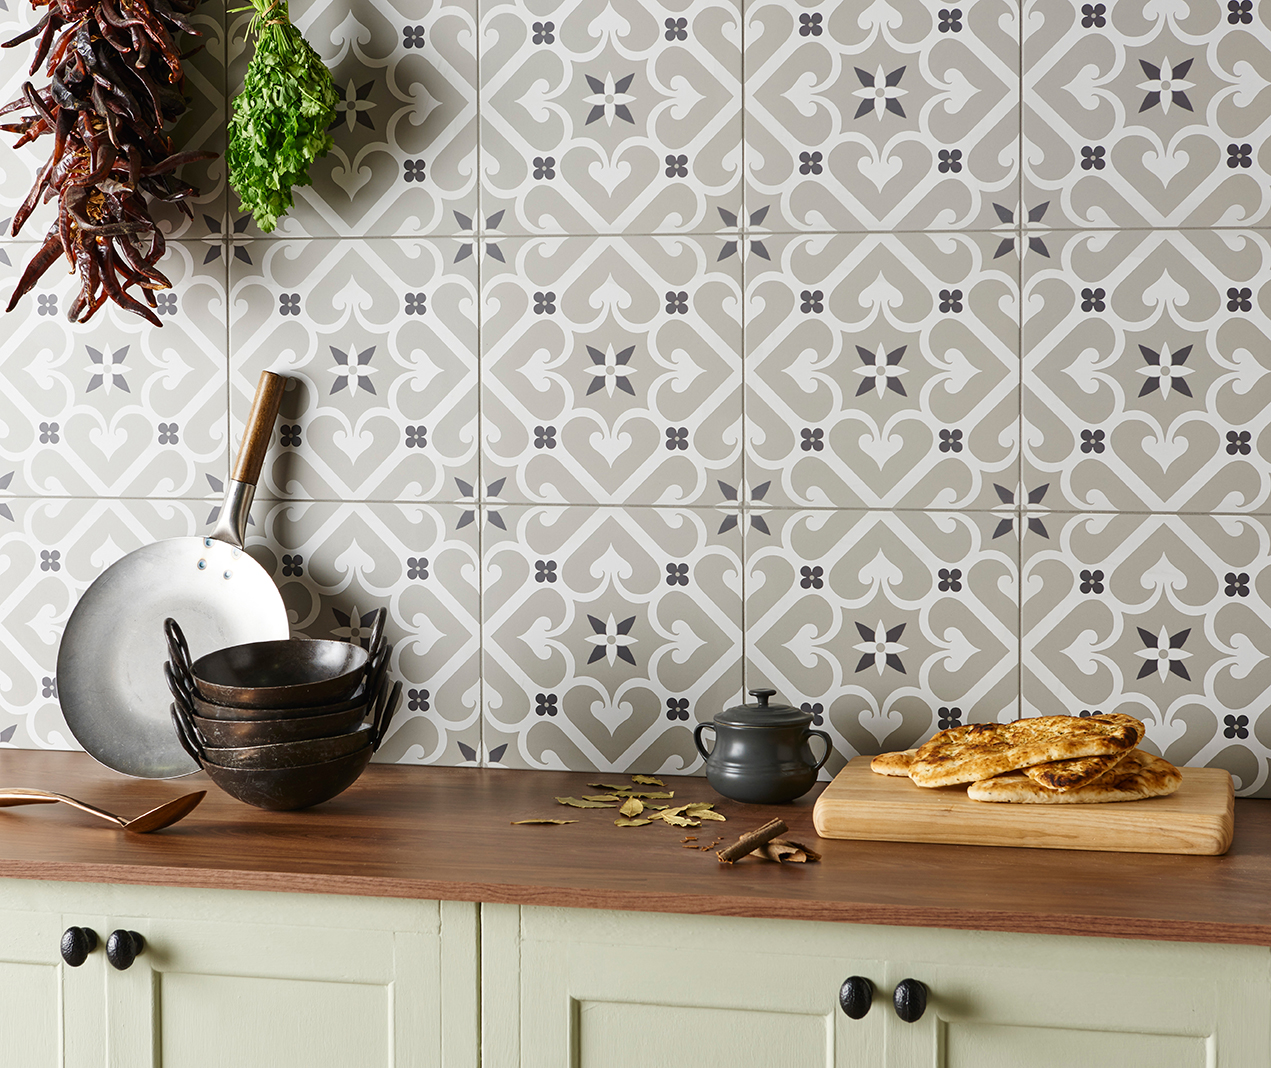 Odyssey Grande Epoque Grey and White on Grey Ceramic Tiles